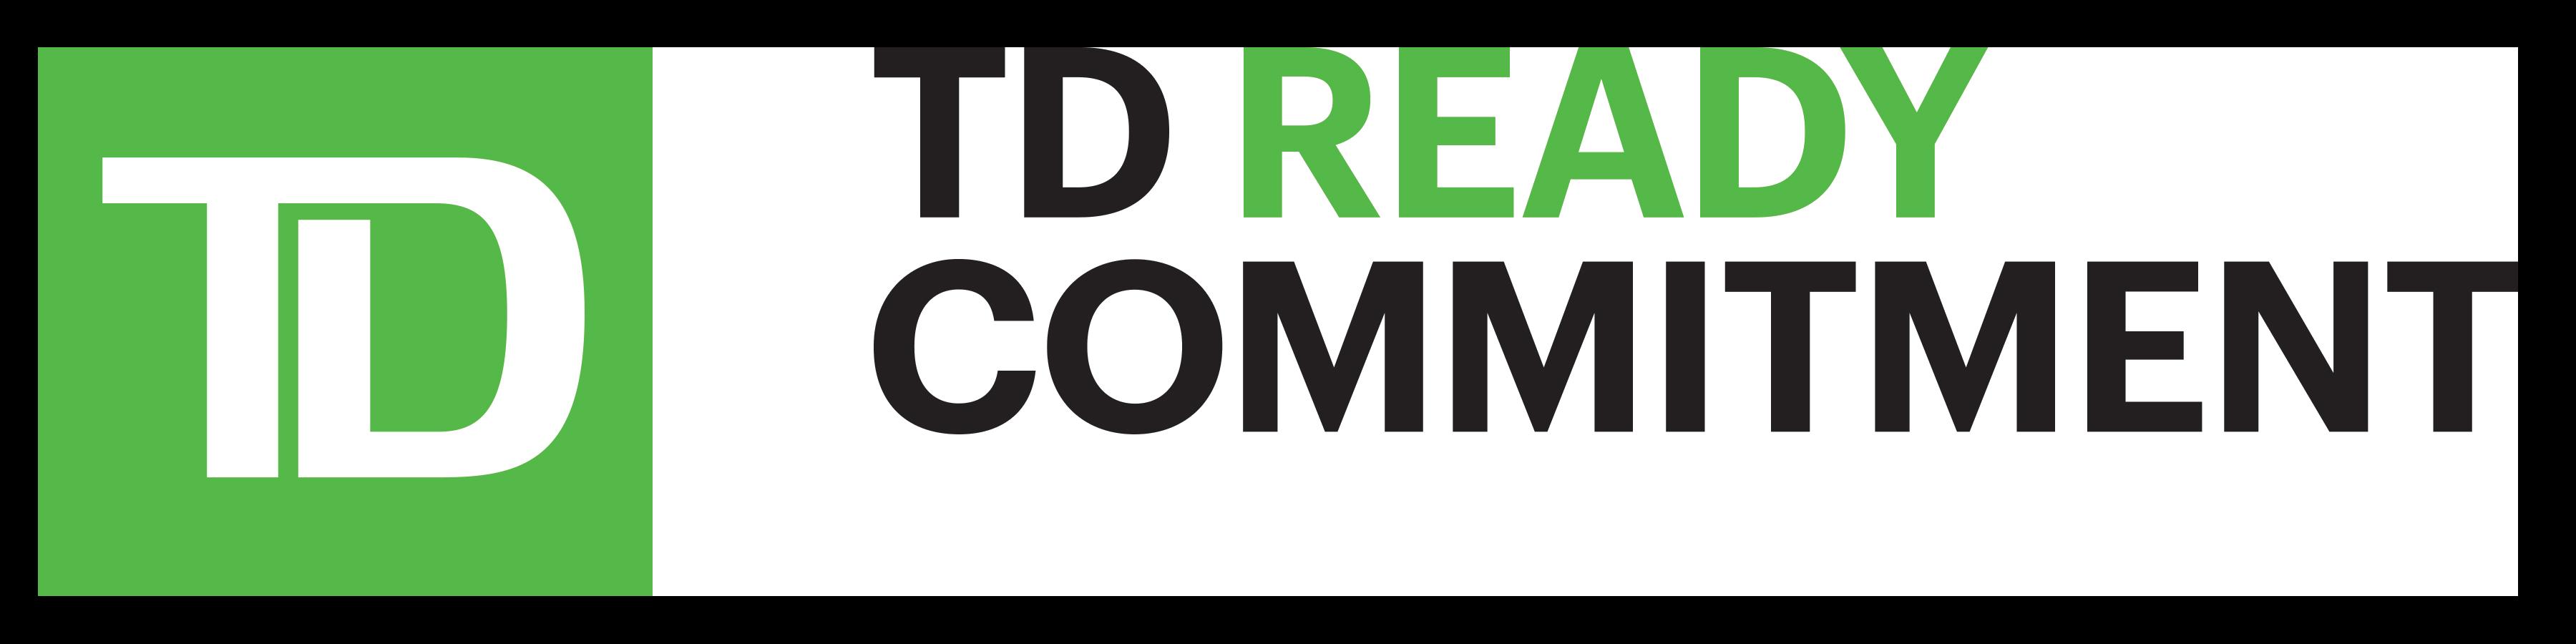 TD Ready Commitment logo.